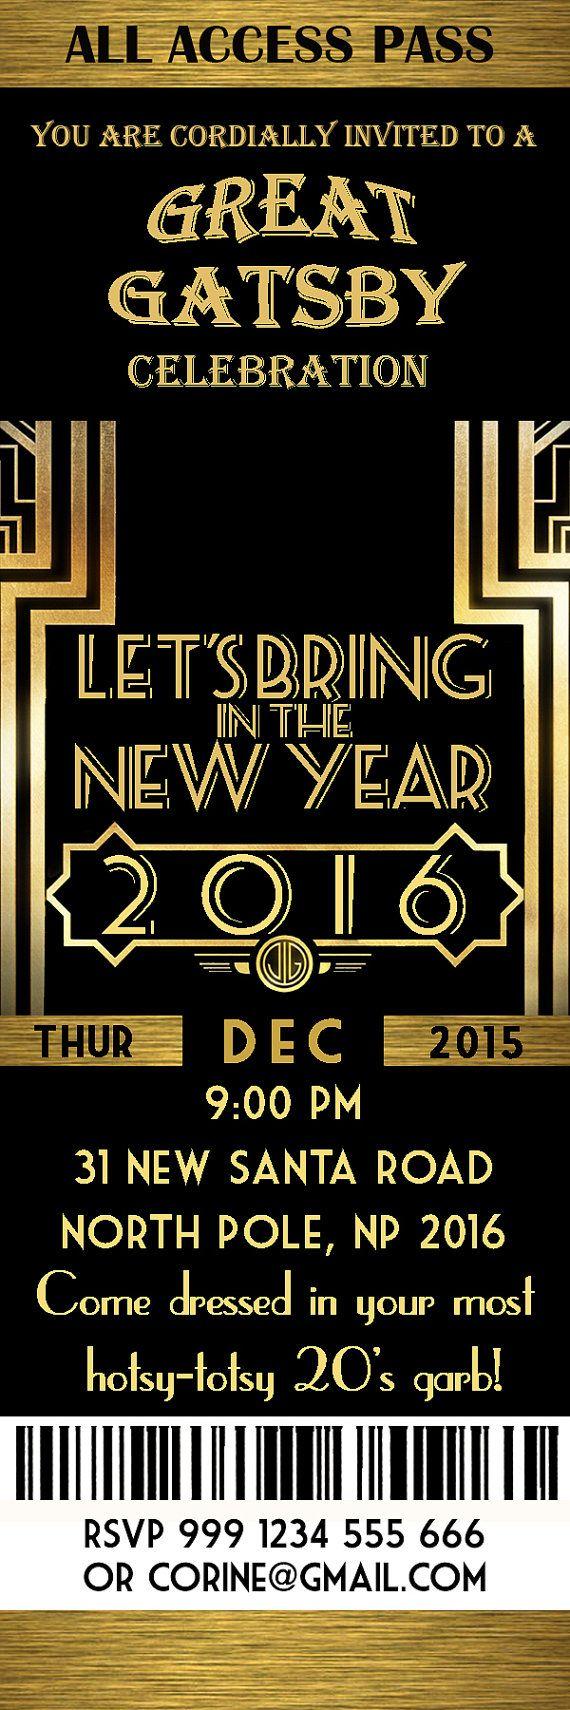 Great Gatsby Invitation, New Year invitation, New Year\'s Eve ...